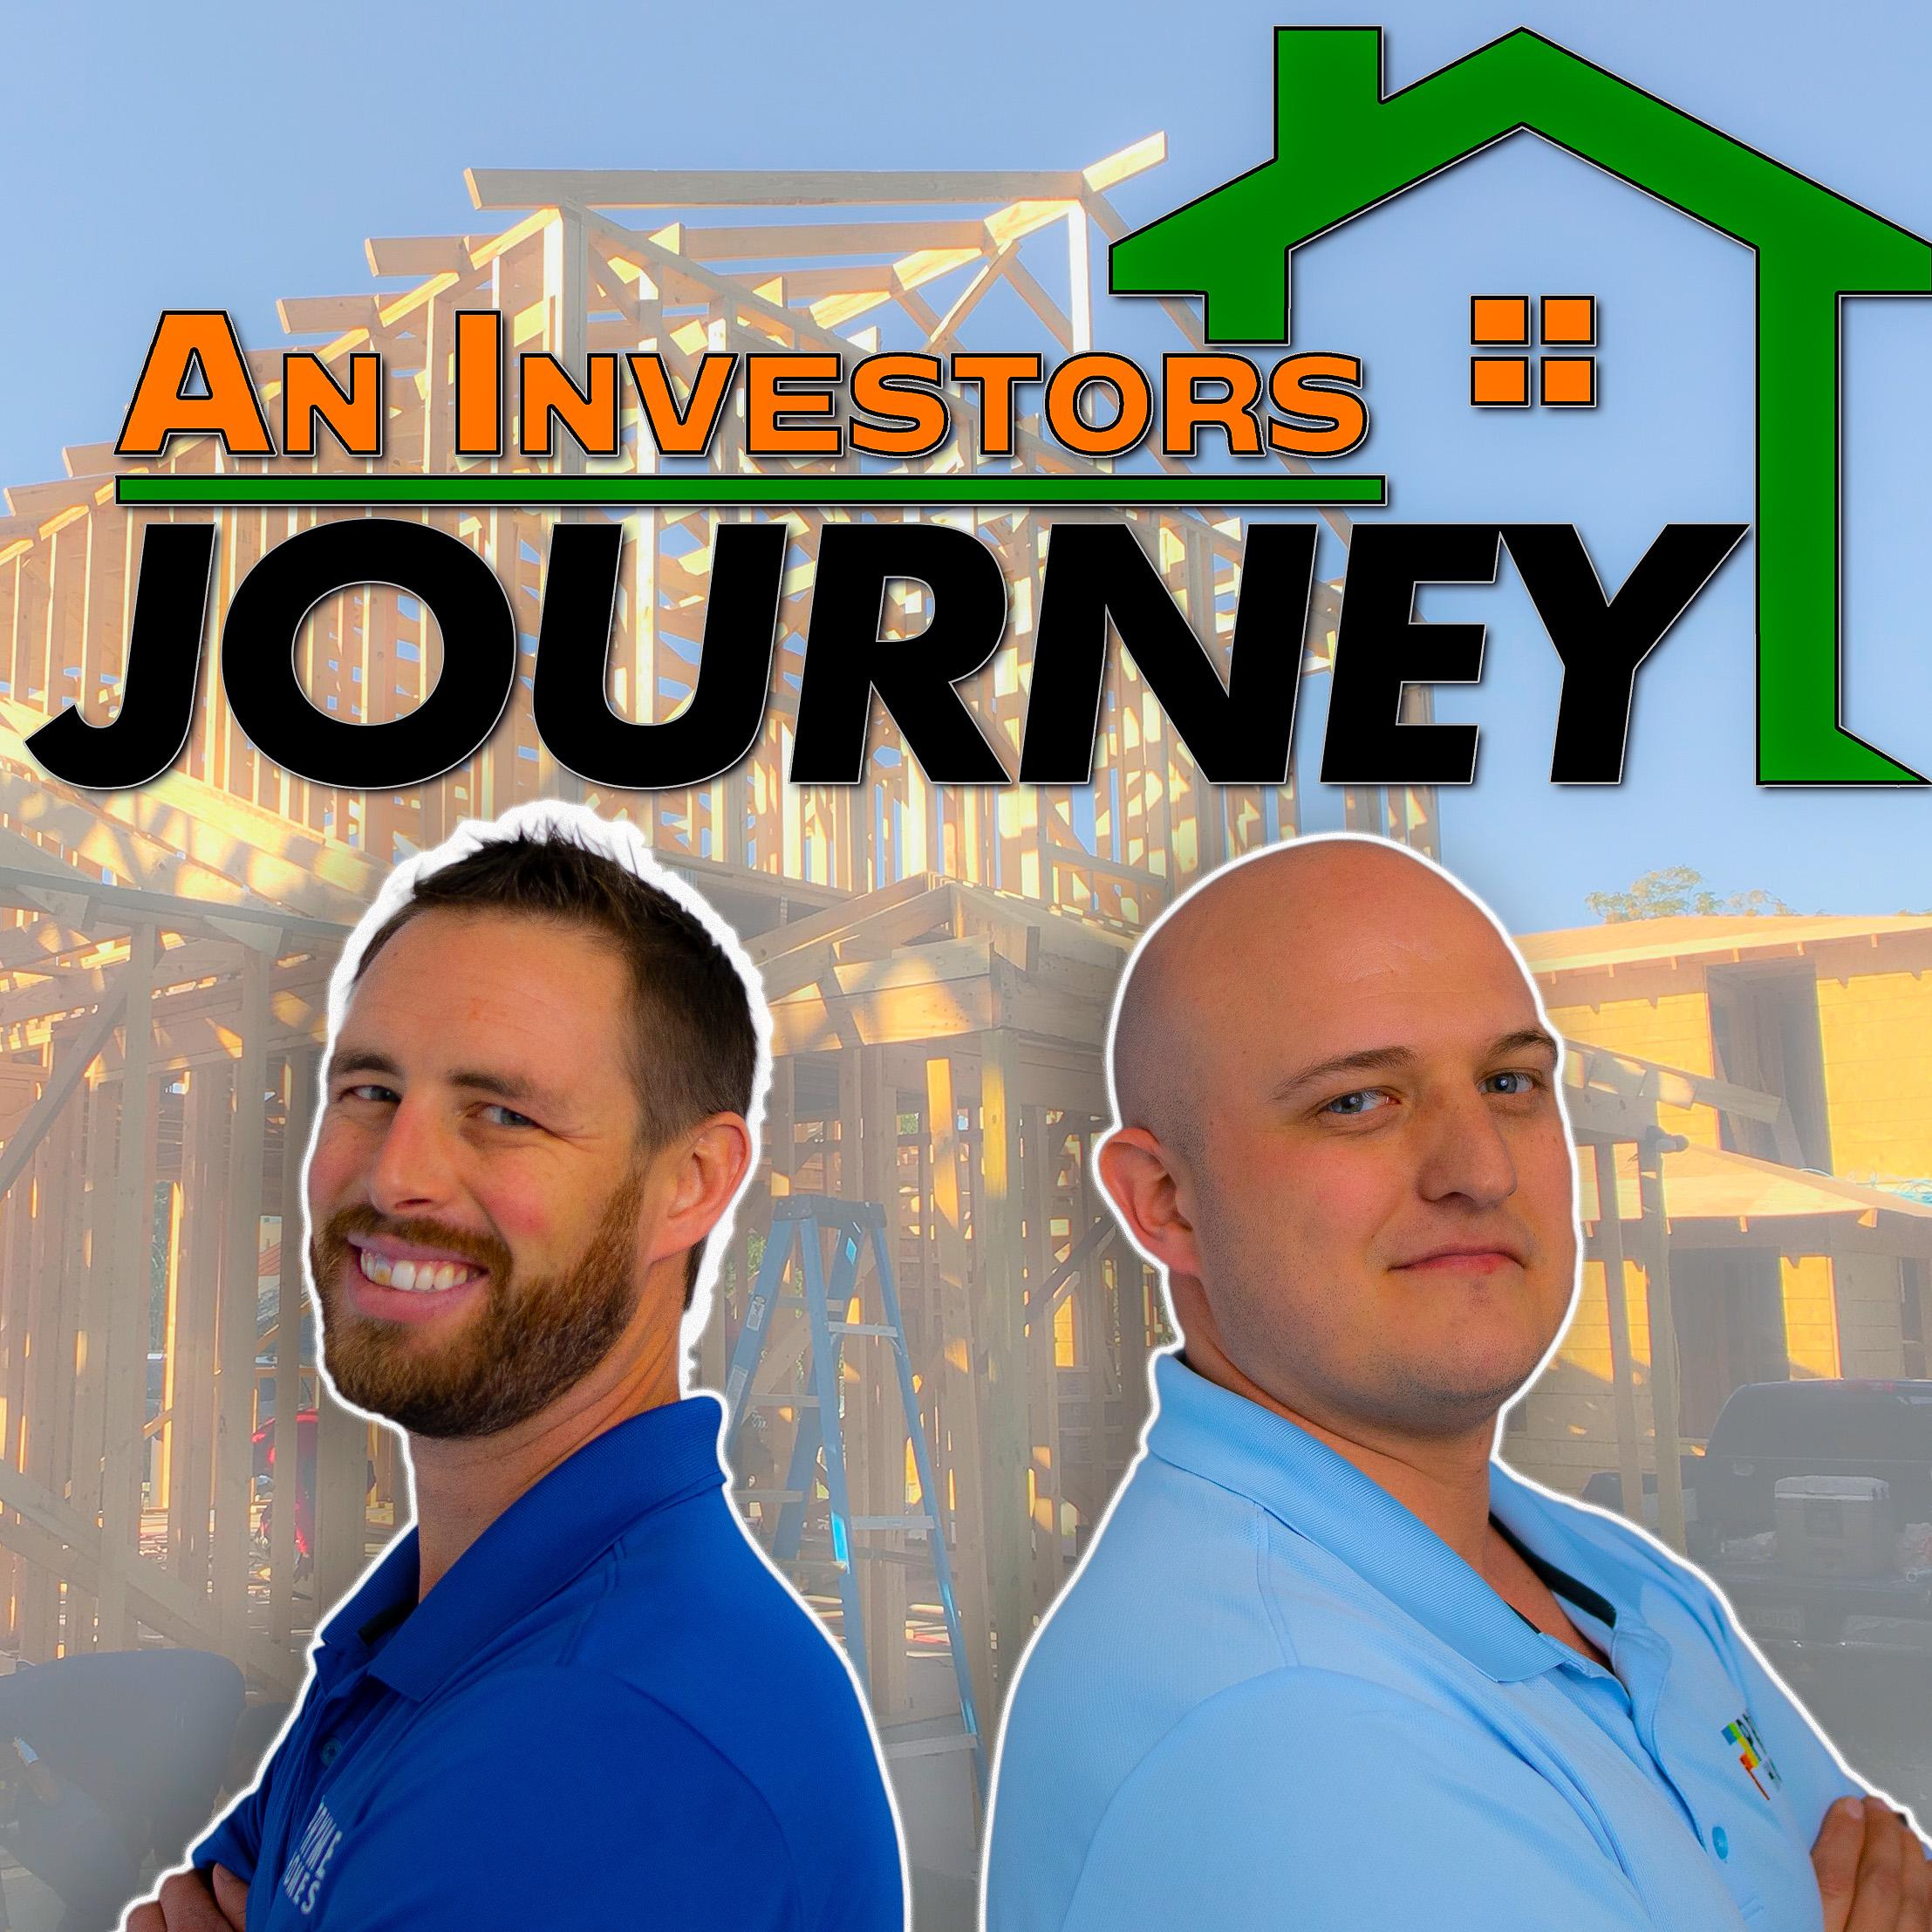 Artwork for podcast An Investor's Journey